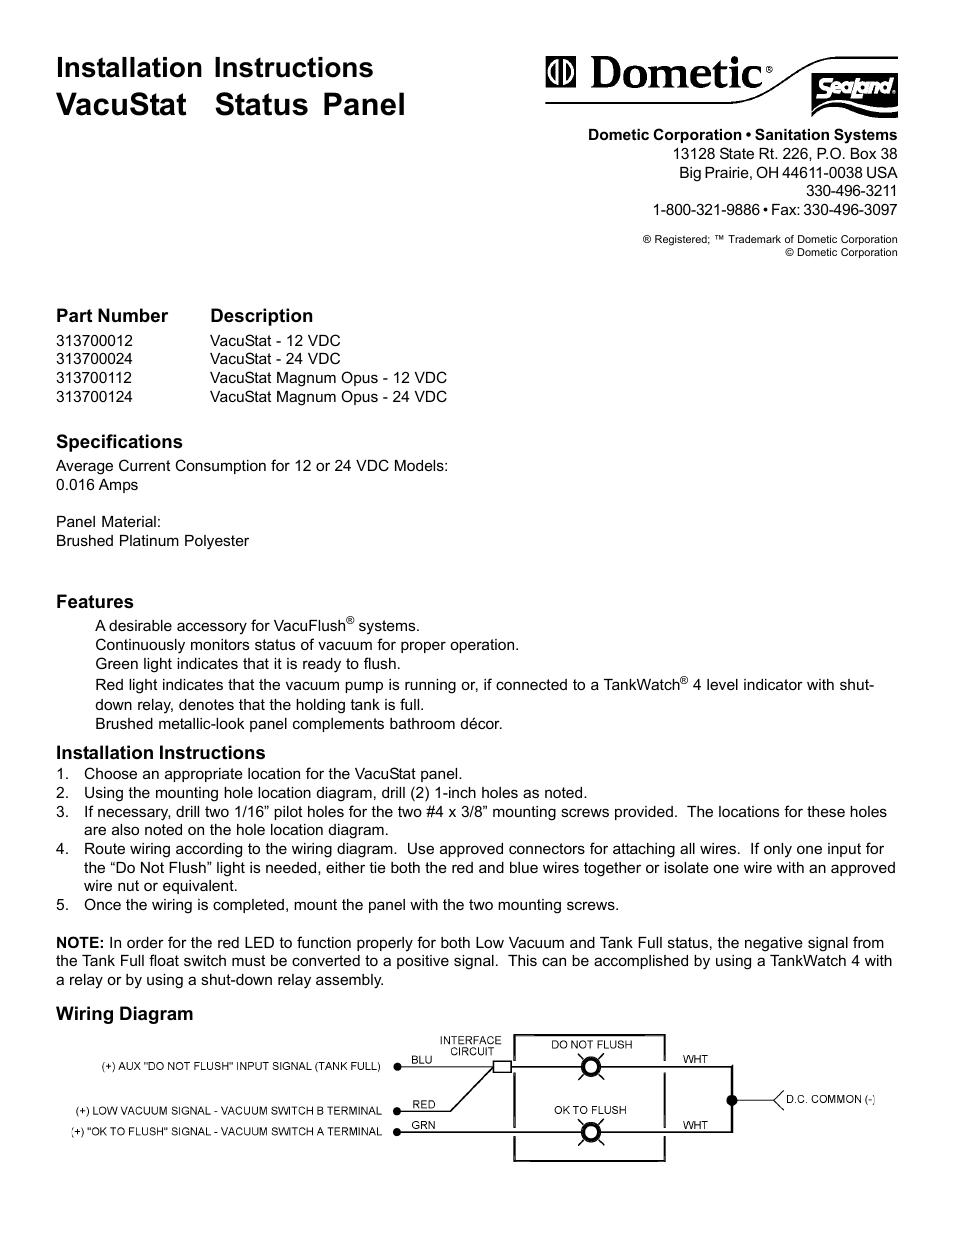 Sealand Vacustat Status Panel User Manual